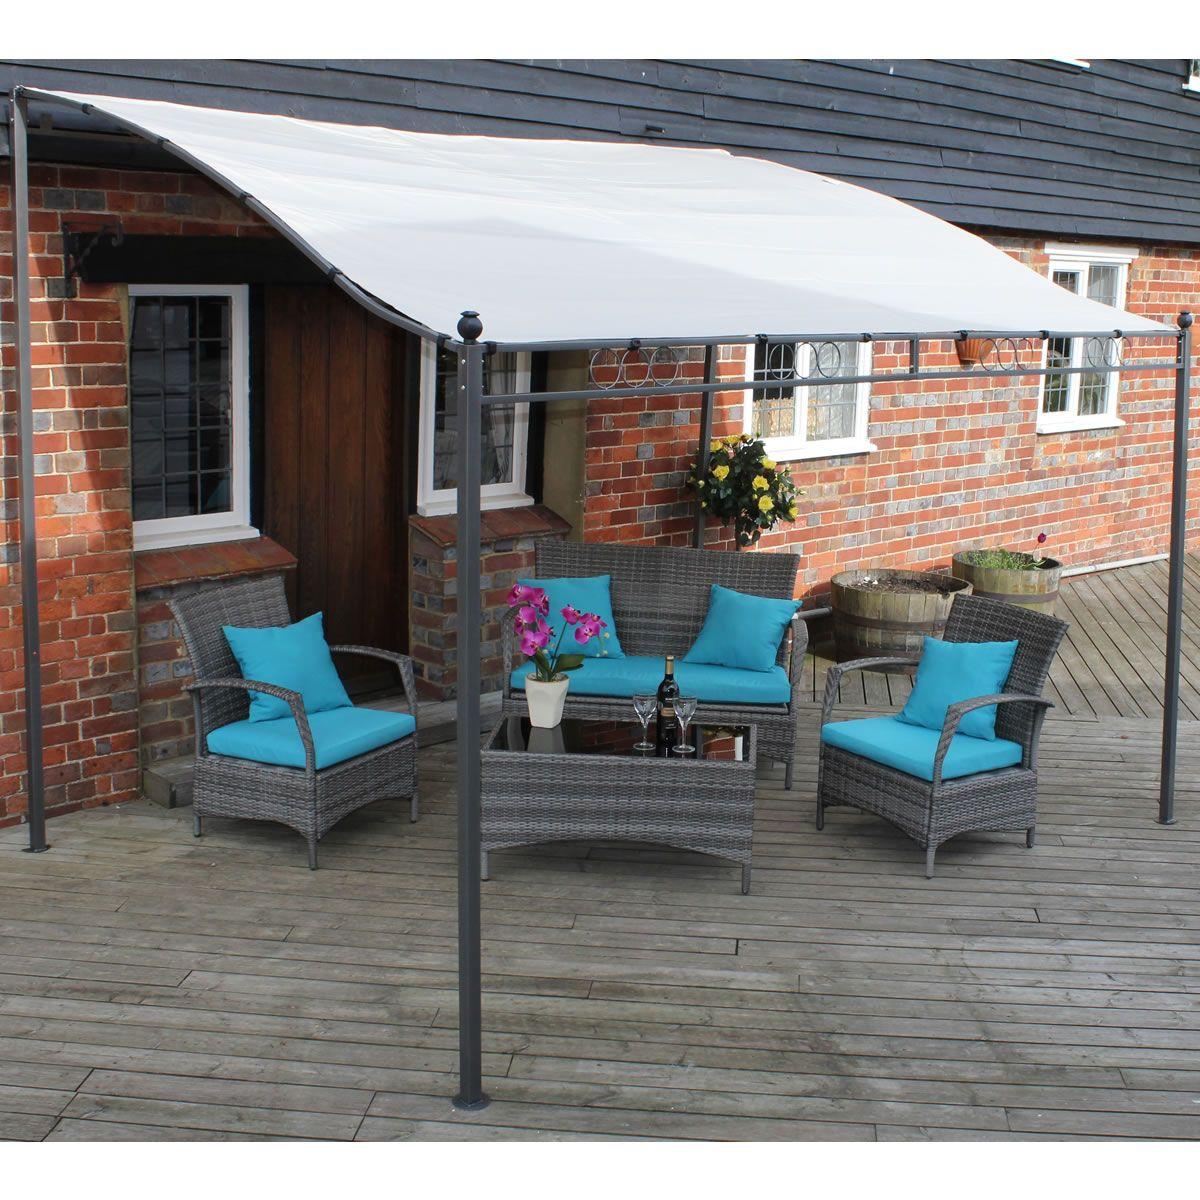 Aluminium Free Standing Canopy Lean To Patio Cover Carport ...